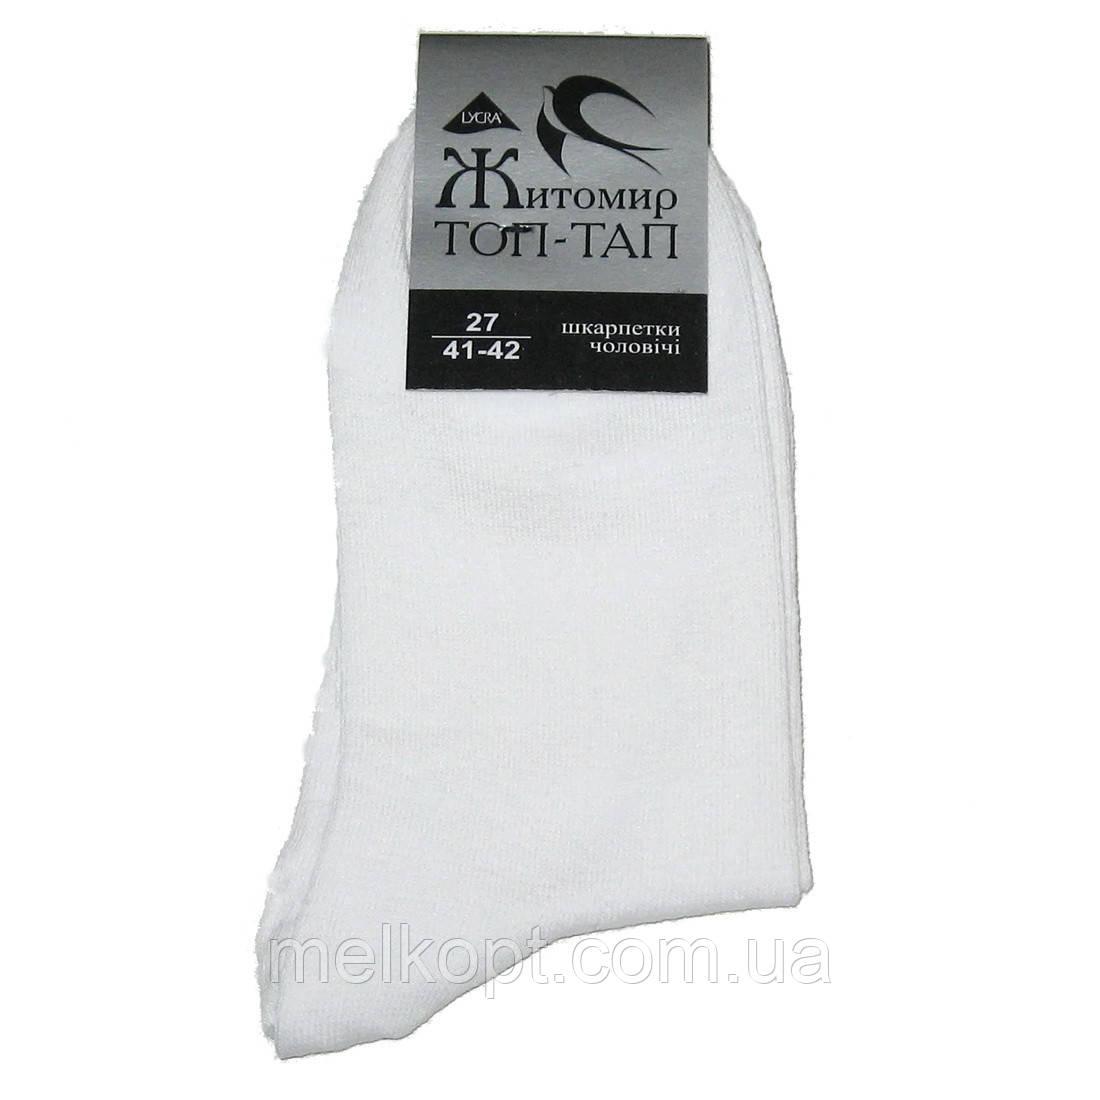 Мужские носки ТОП-ТАП - 8,30 грн./пара (стрейч, белые)